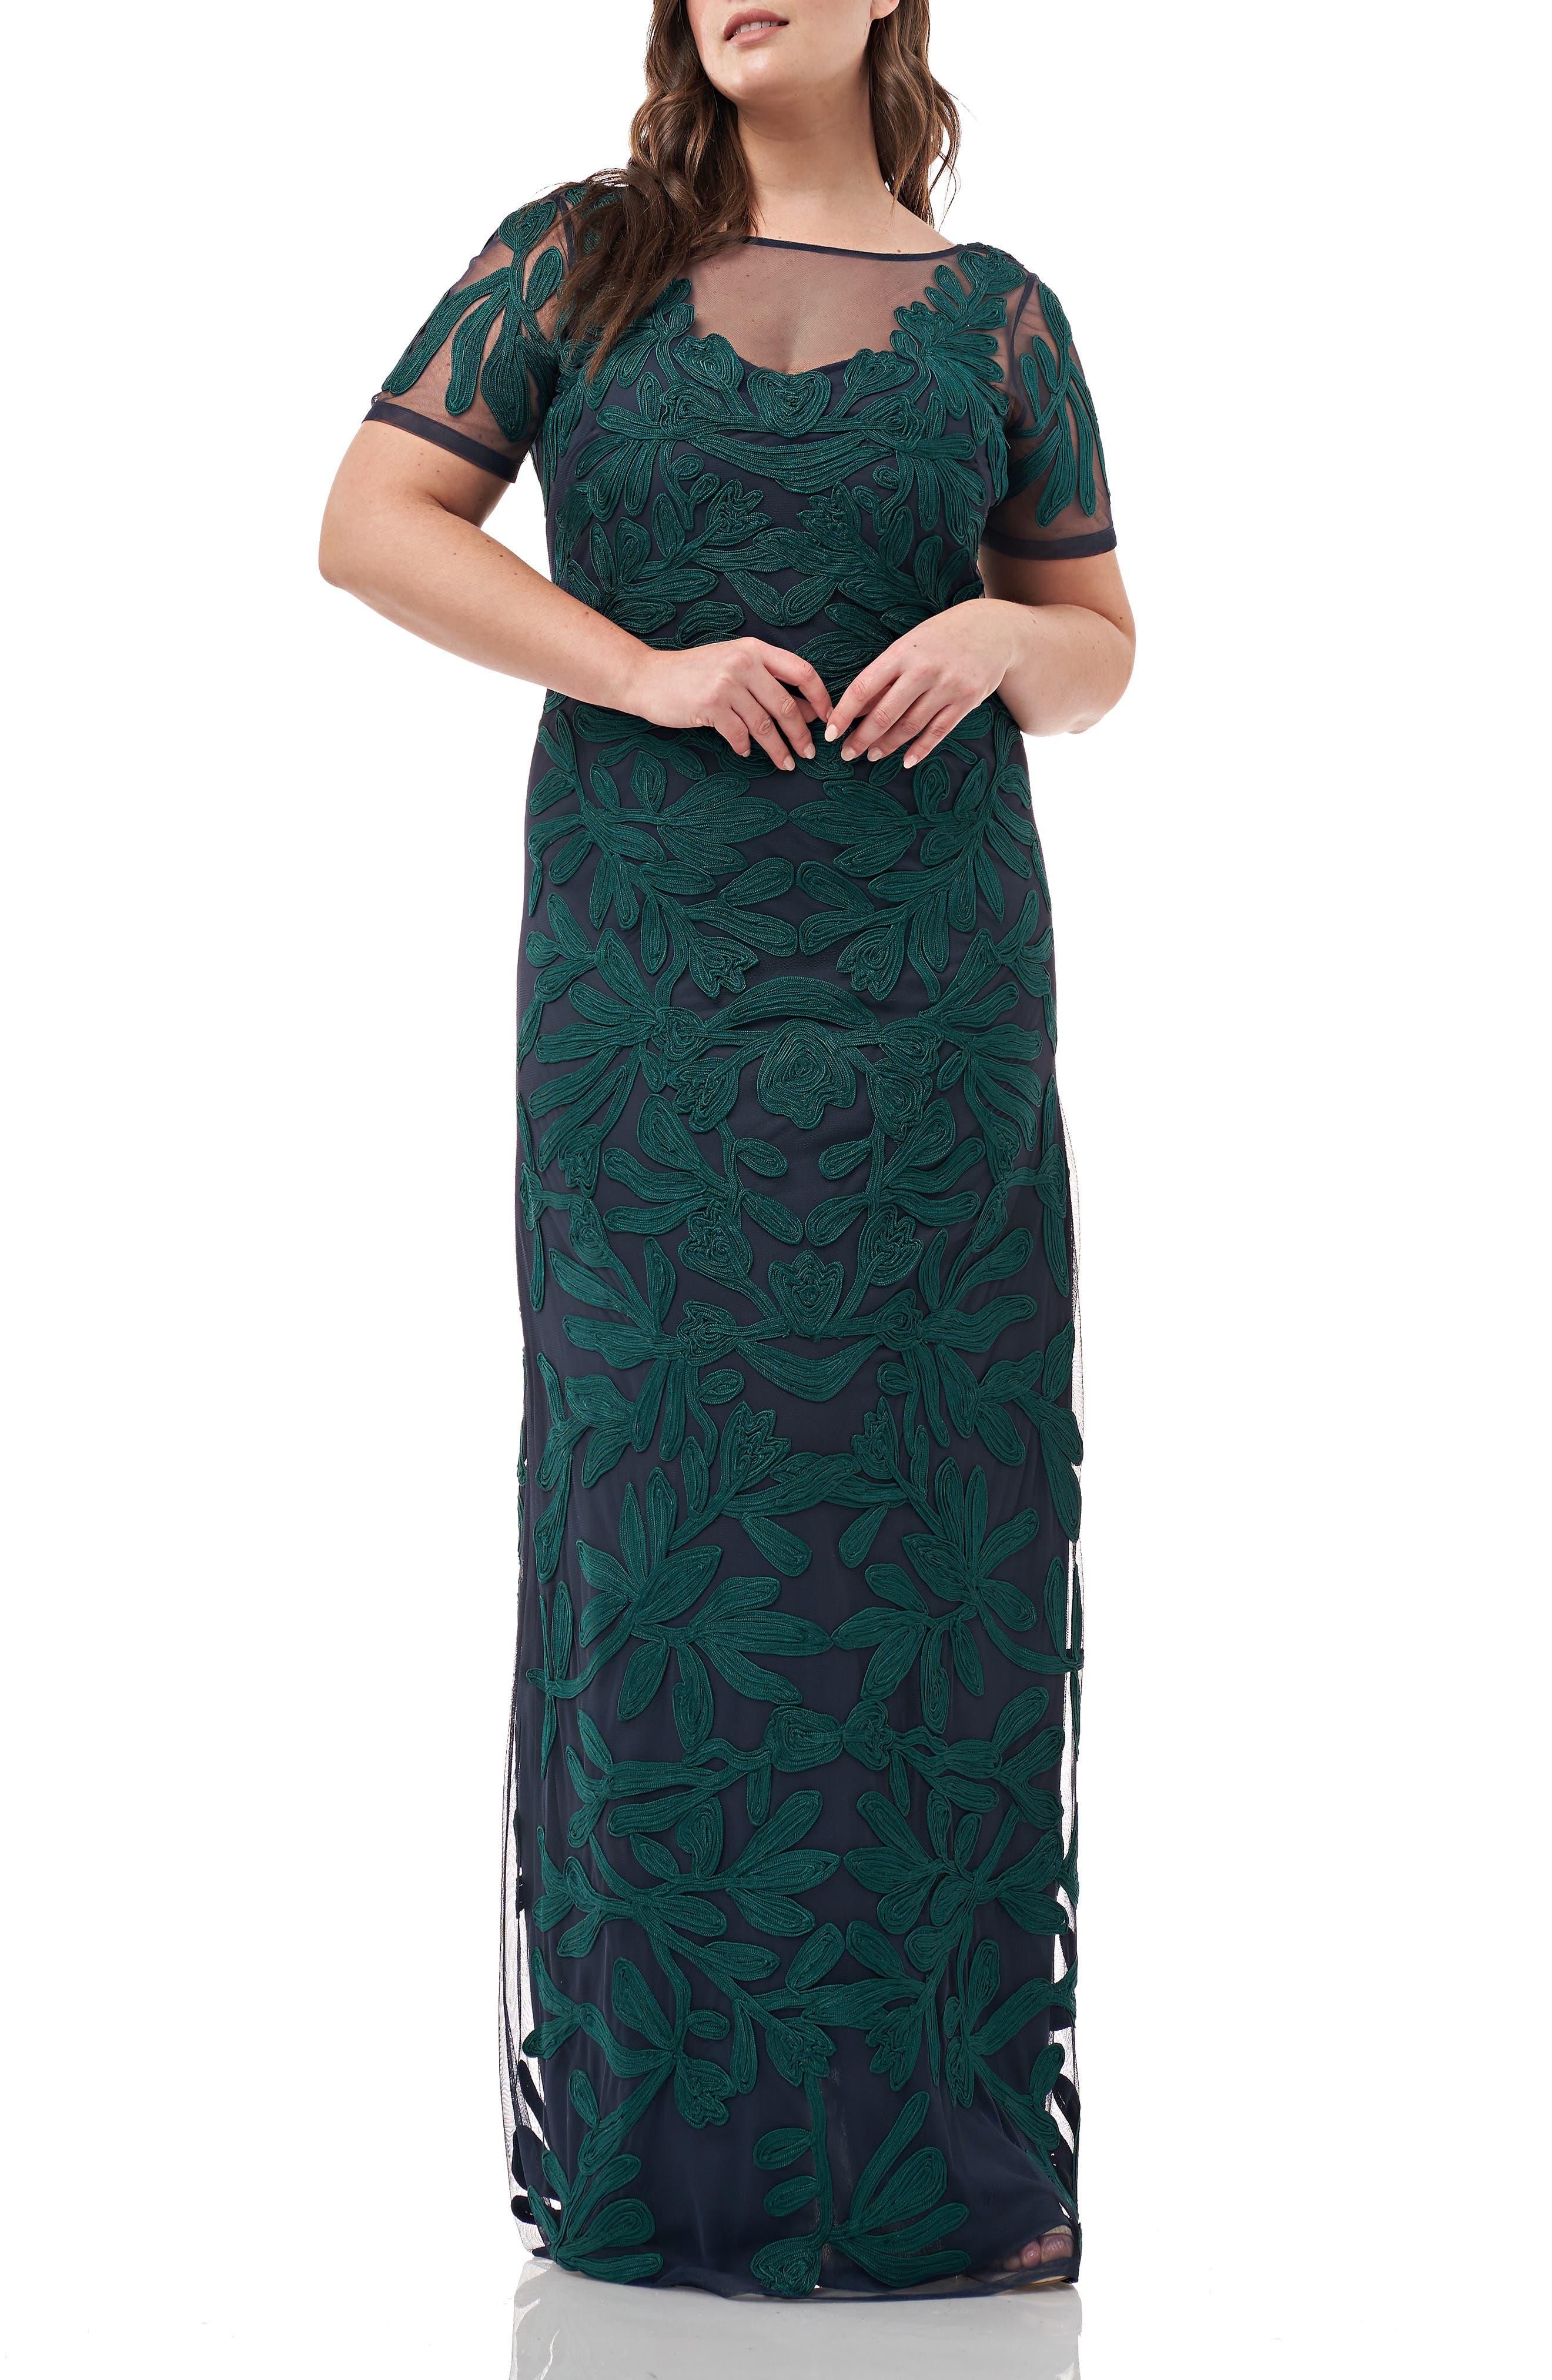 Vintage 1920s Dresses – Where to Buy Plus Size Womens Js Collections Illusion Soutache Evening Dress Size 22W - Green $388.00 AT vintagedancer.com